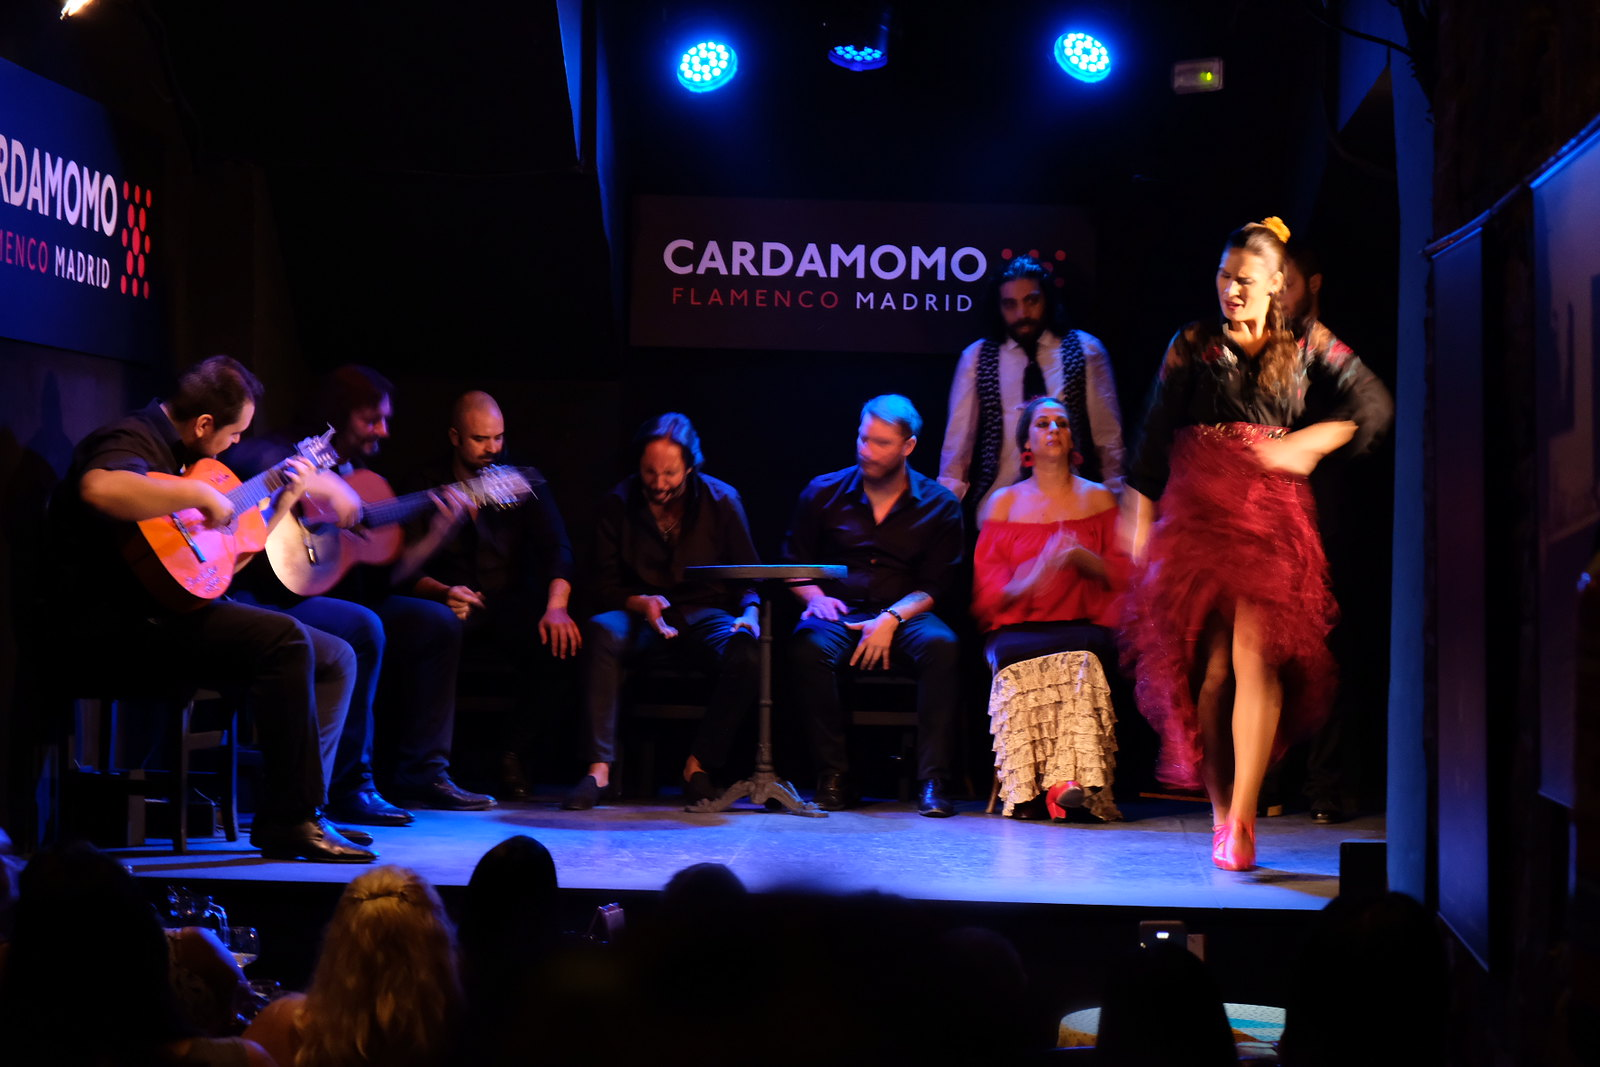 Flamenco Show at Cardamomo